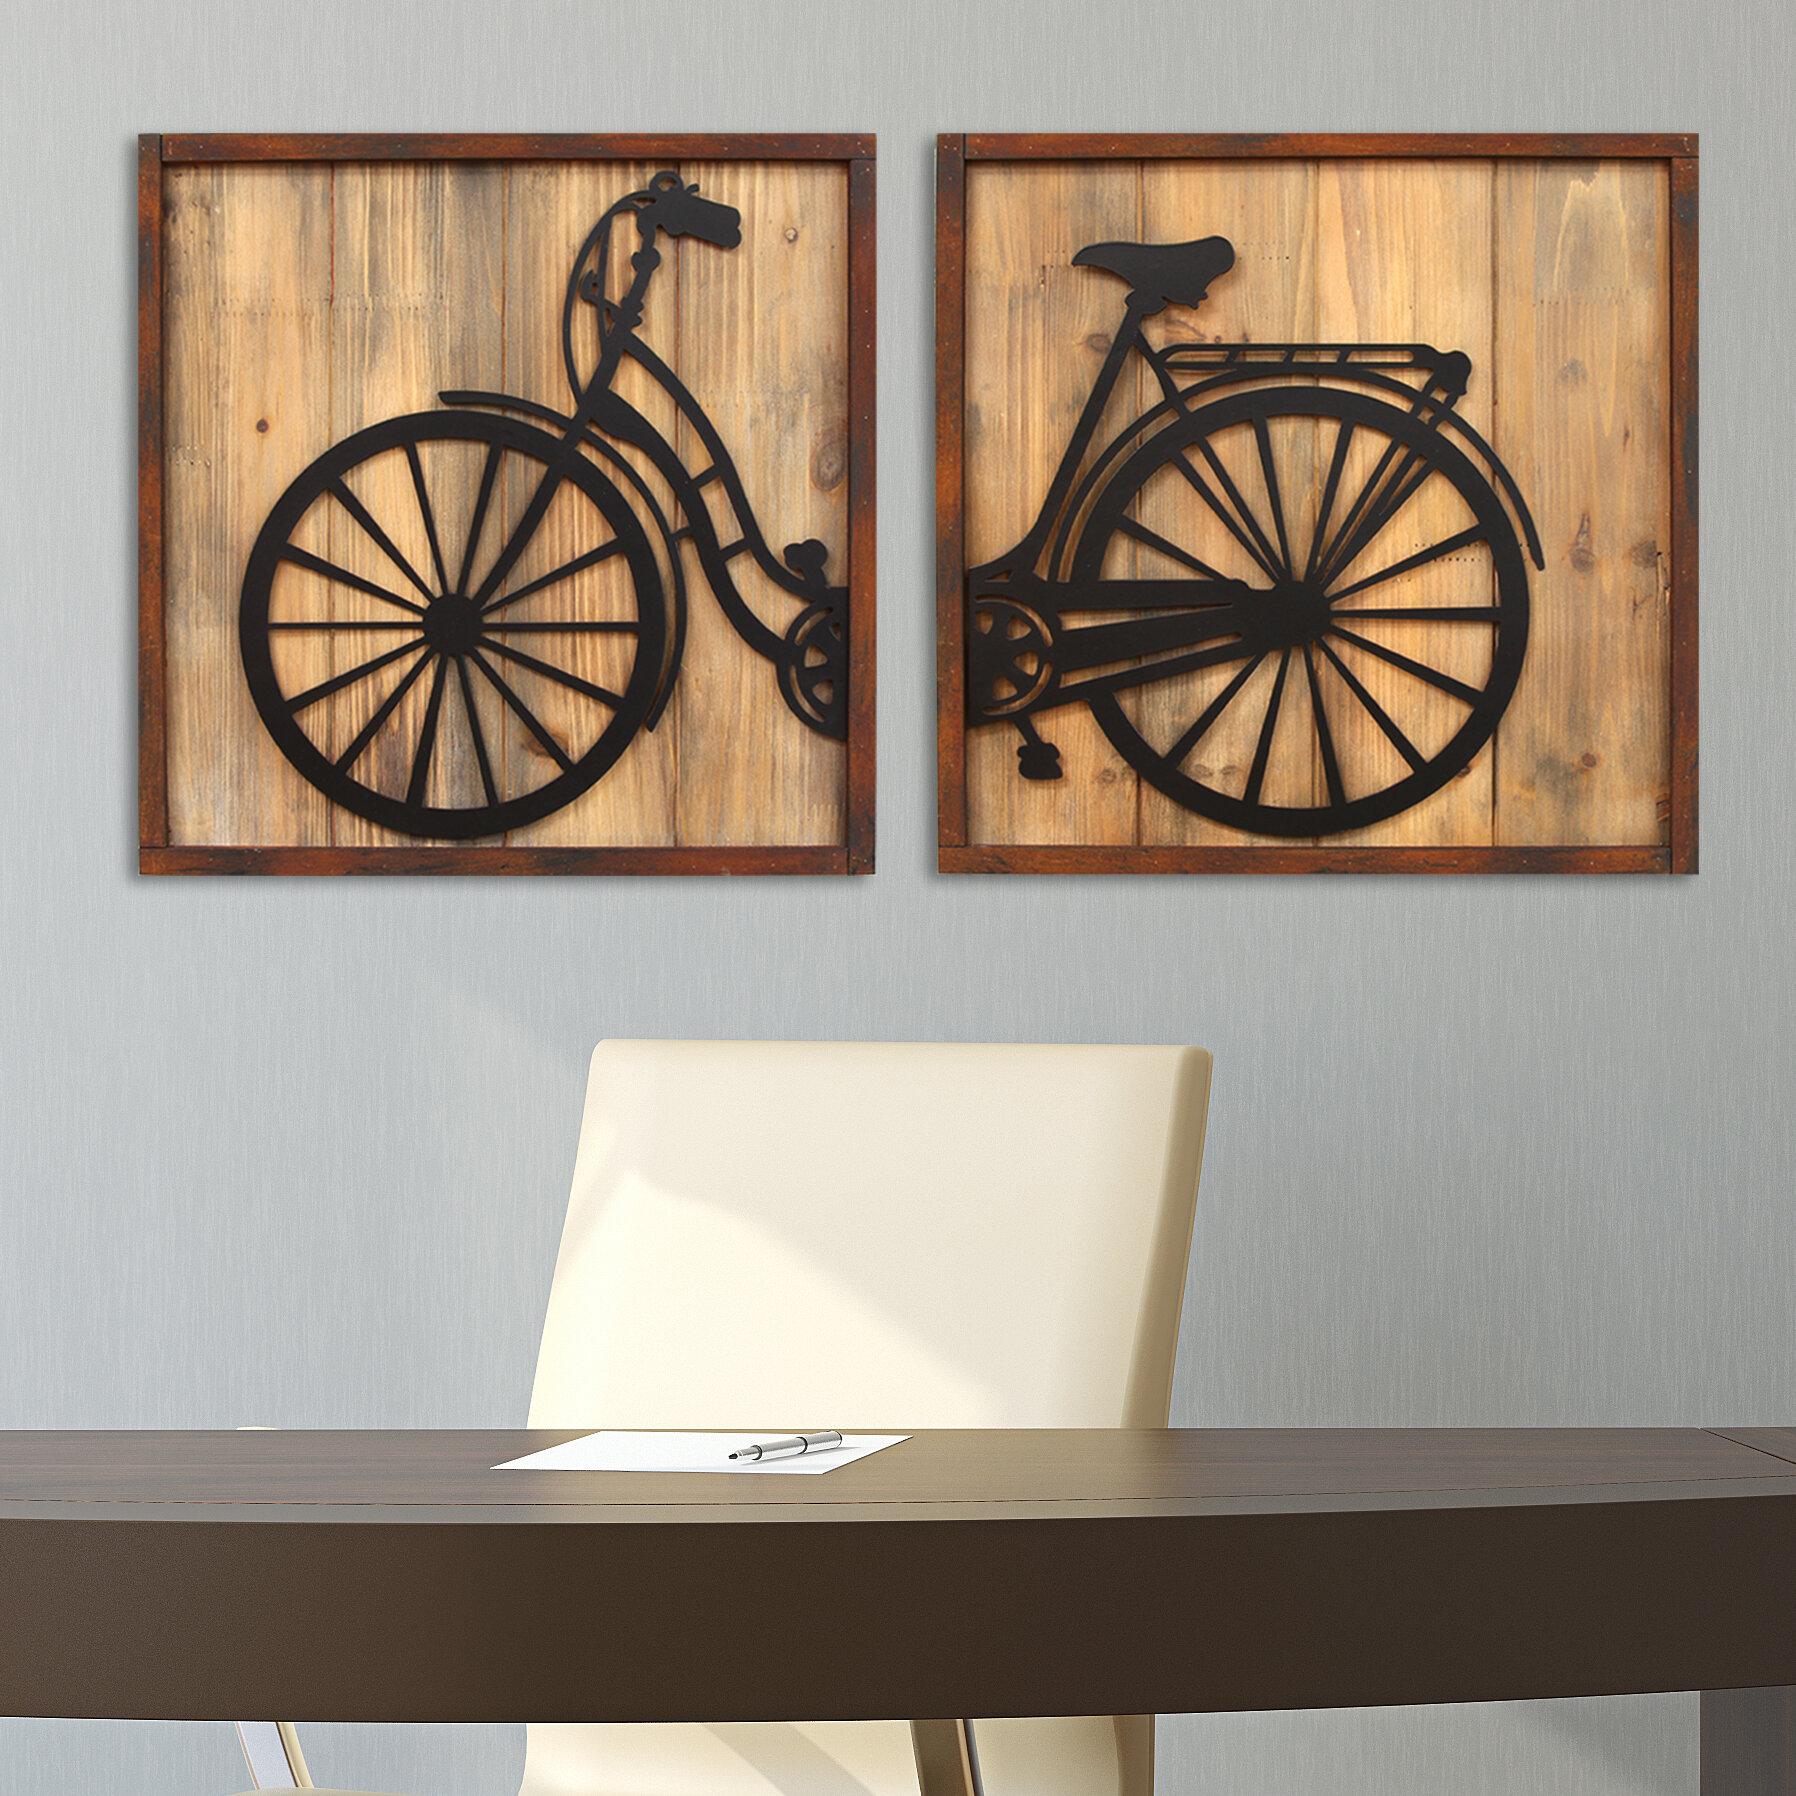 Wall Art Decor Sets: Stratton Home Decor 2 Piece Retro Bicycle Panels Wall